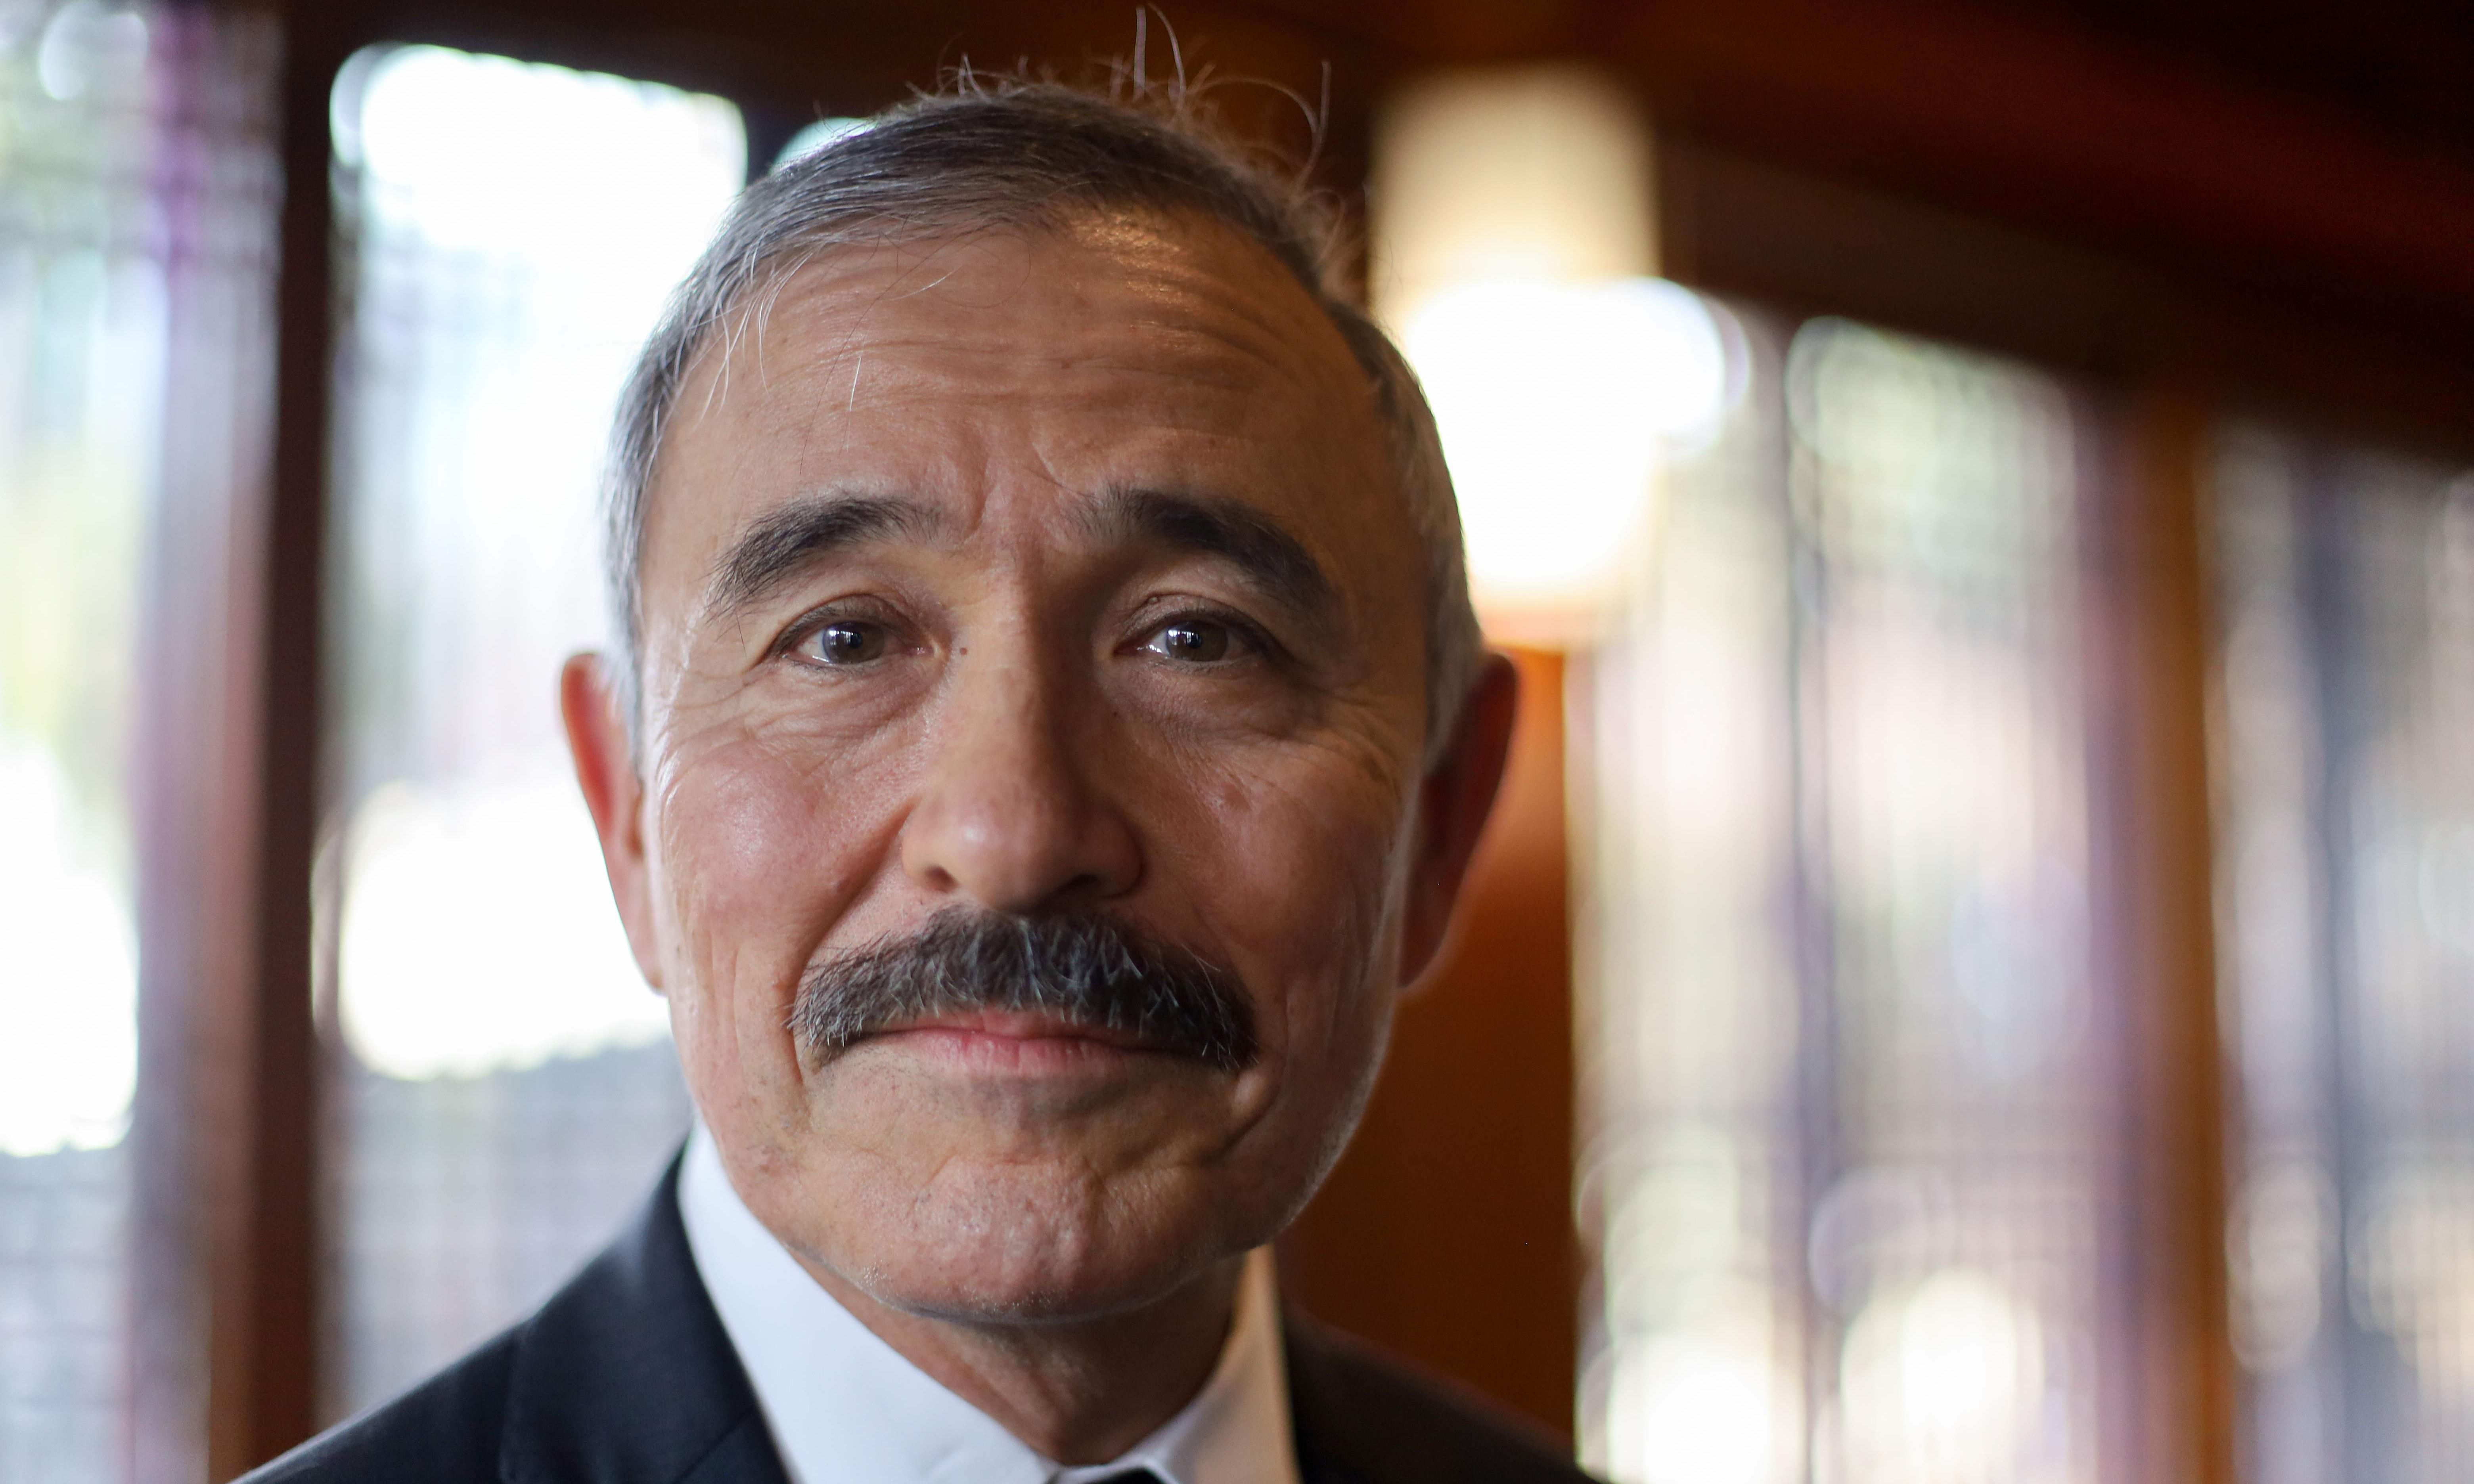 US ambassador's moustache gets up South Korea's nose